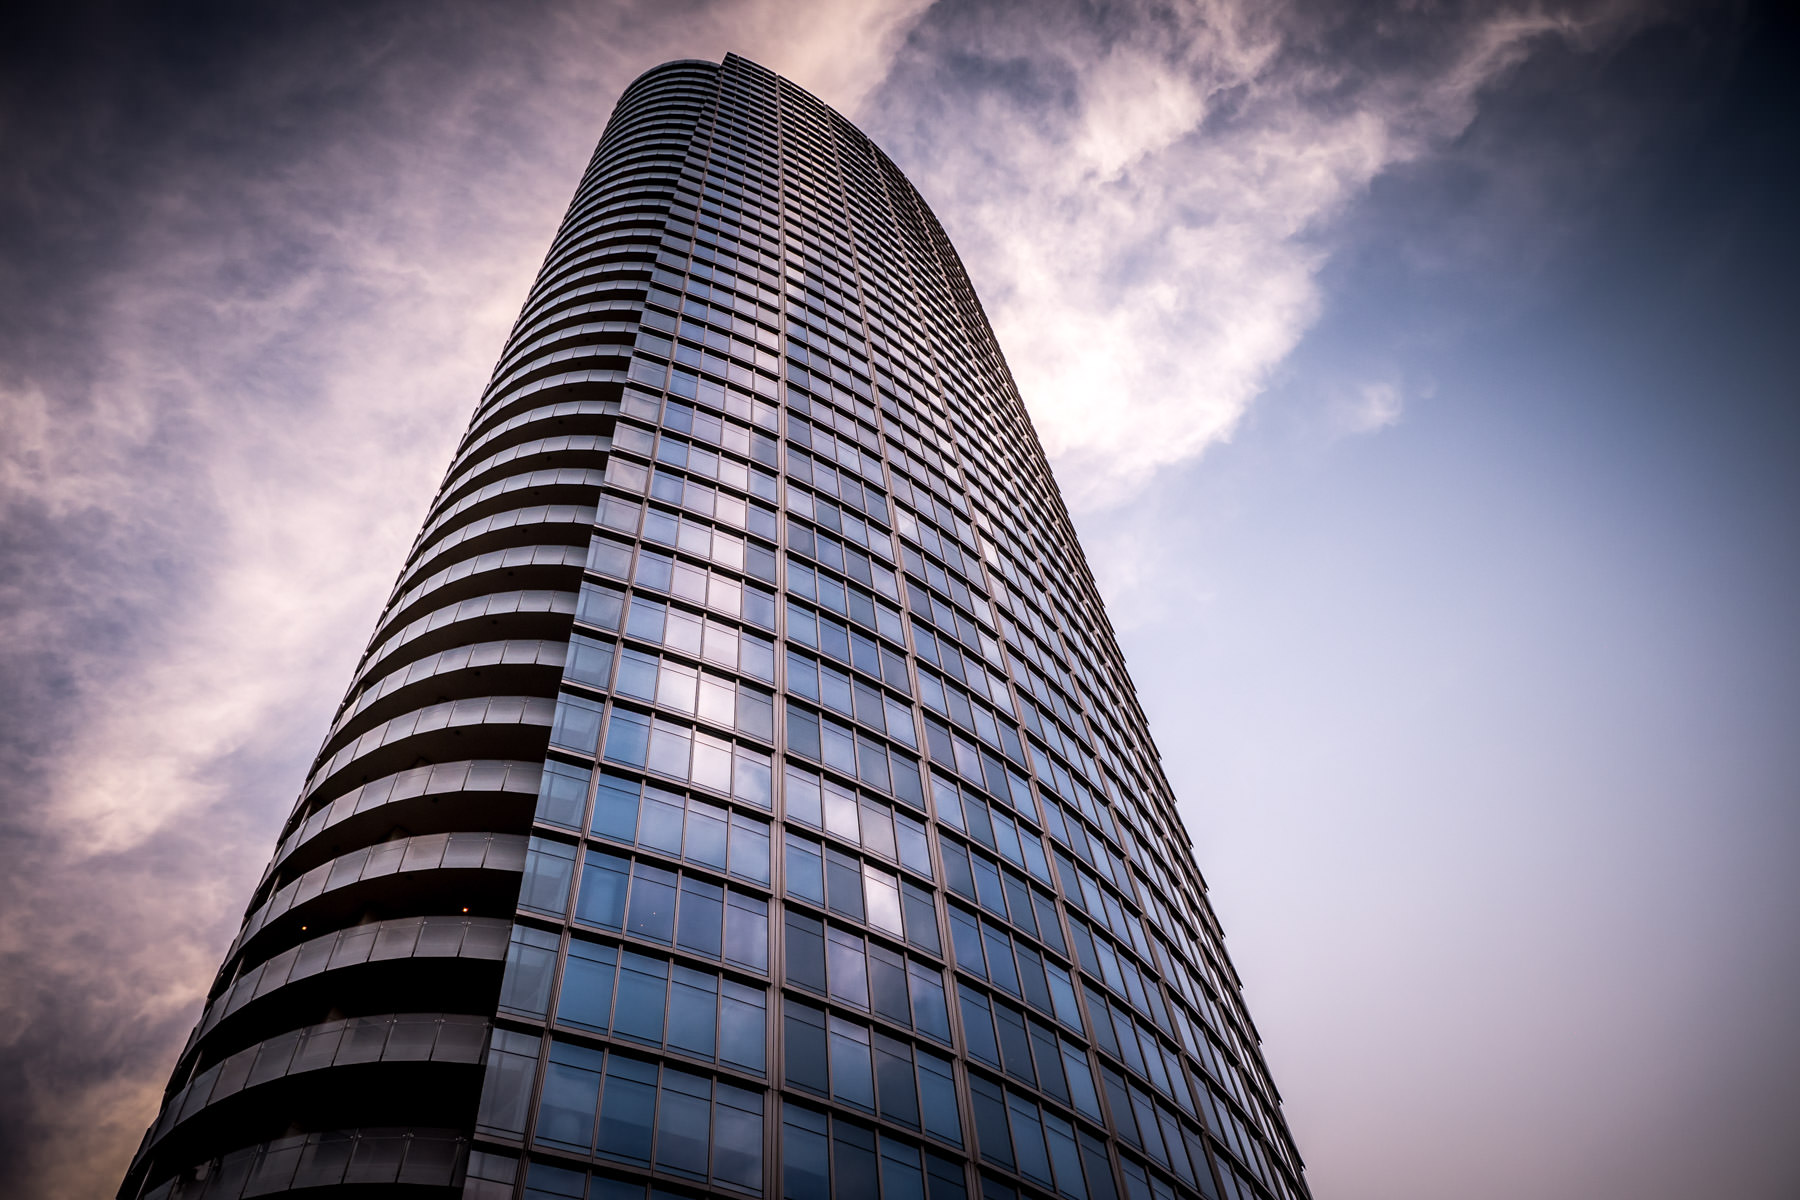 Dallas' Museum Tower rises into the sky over the Dallas Arts District.